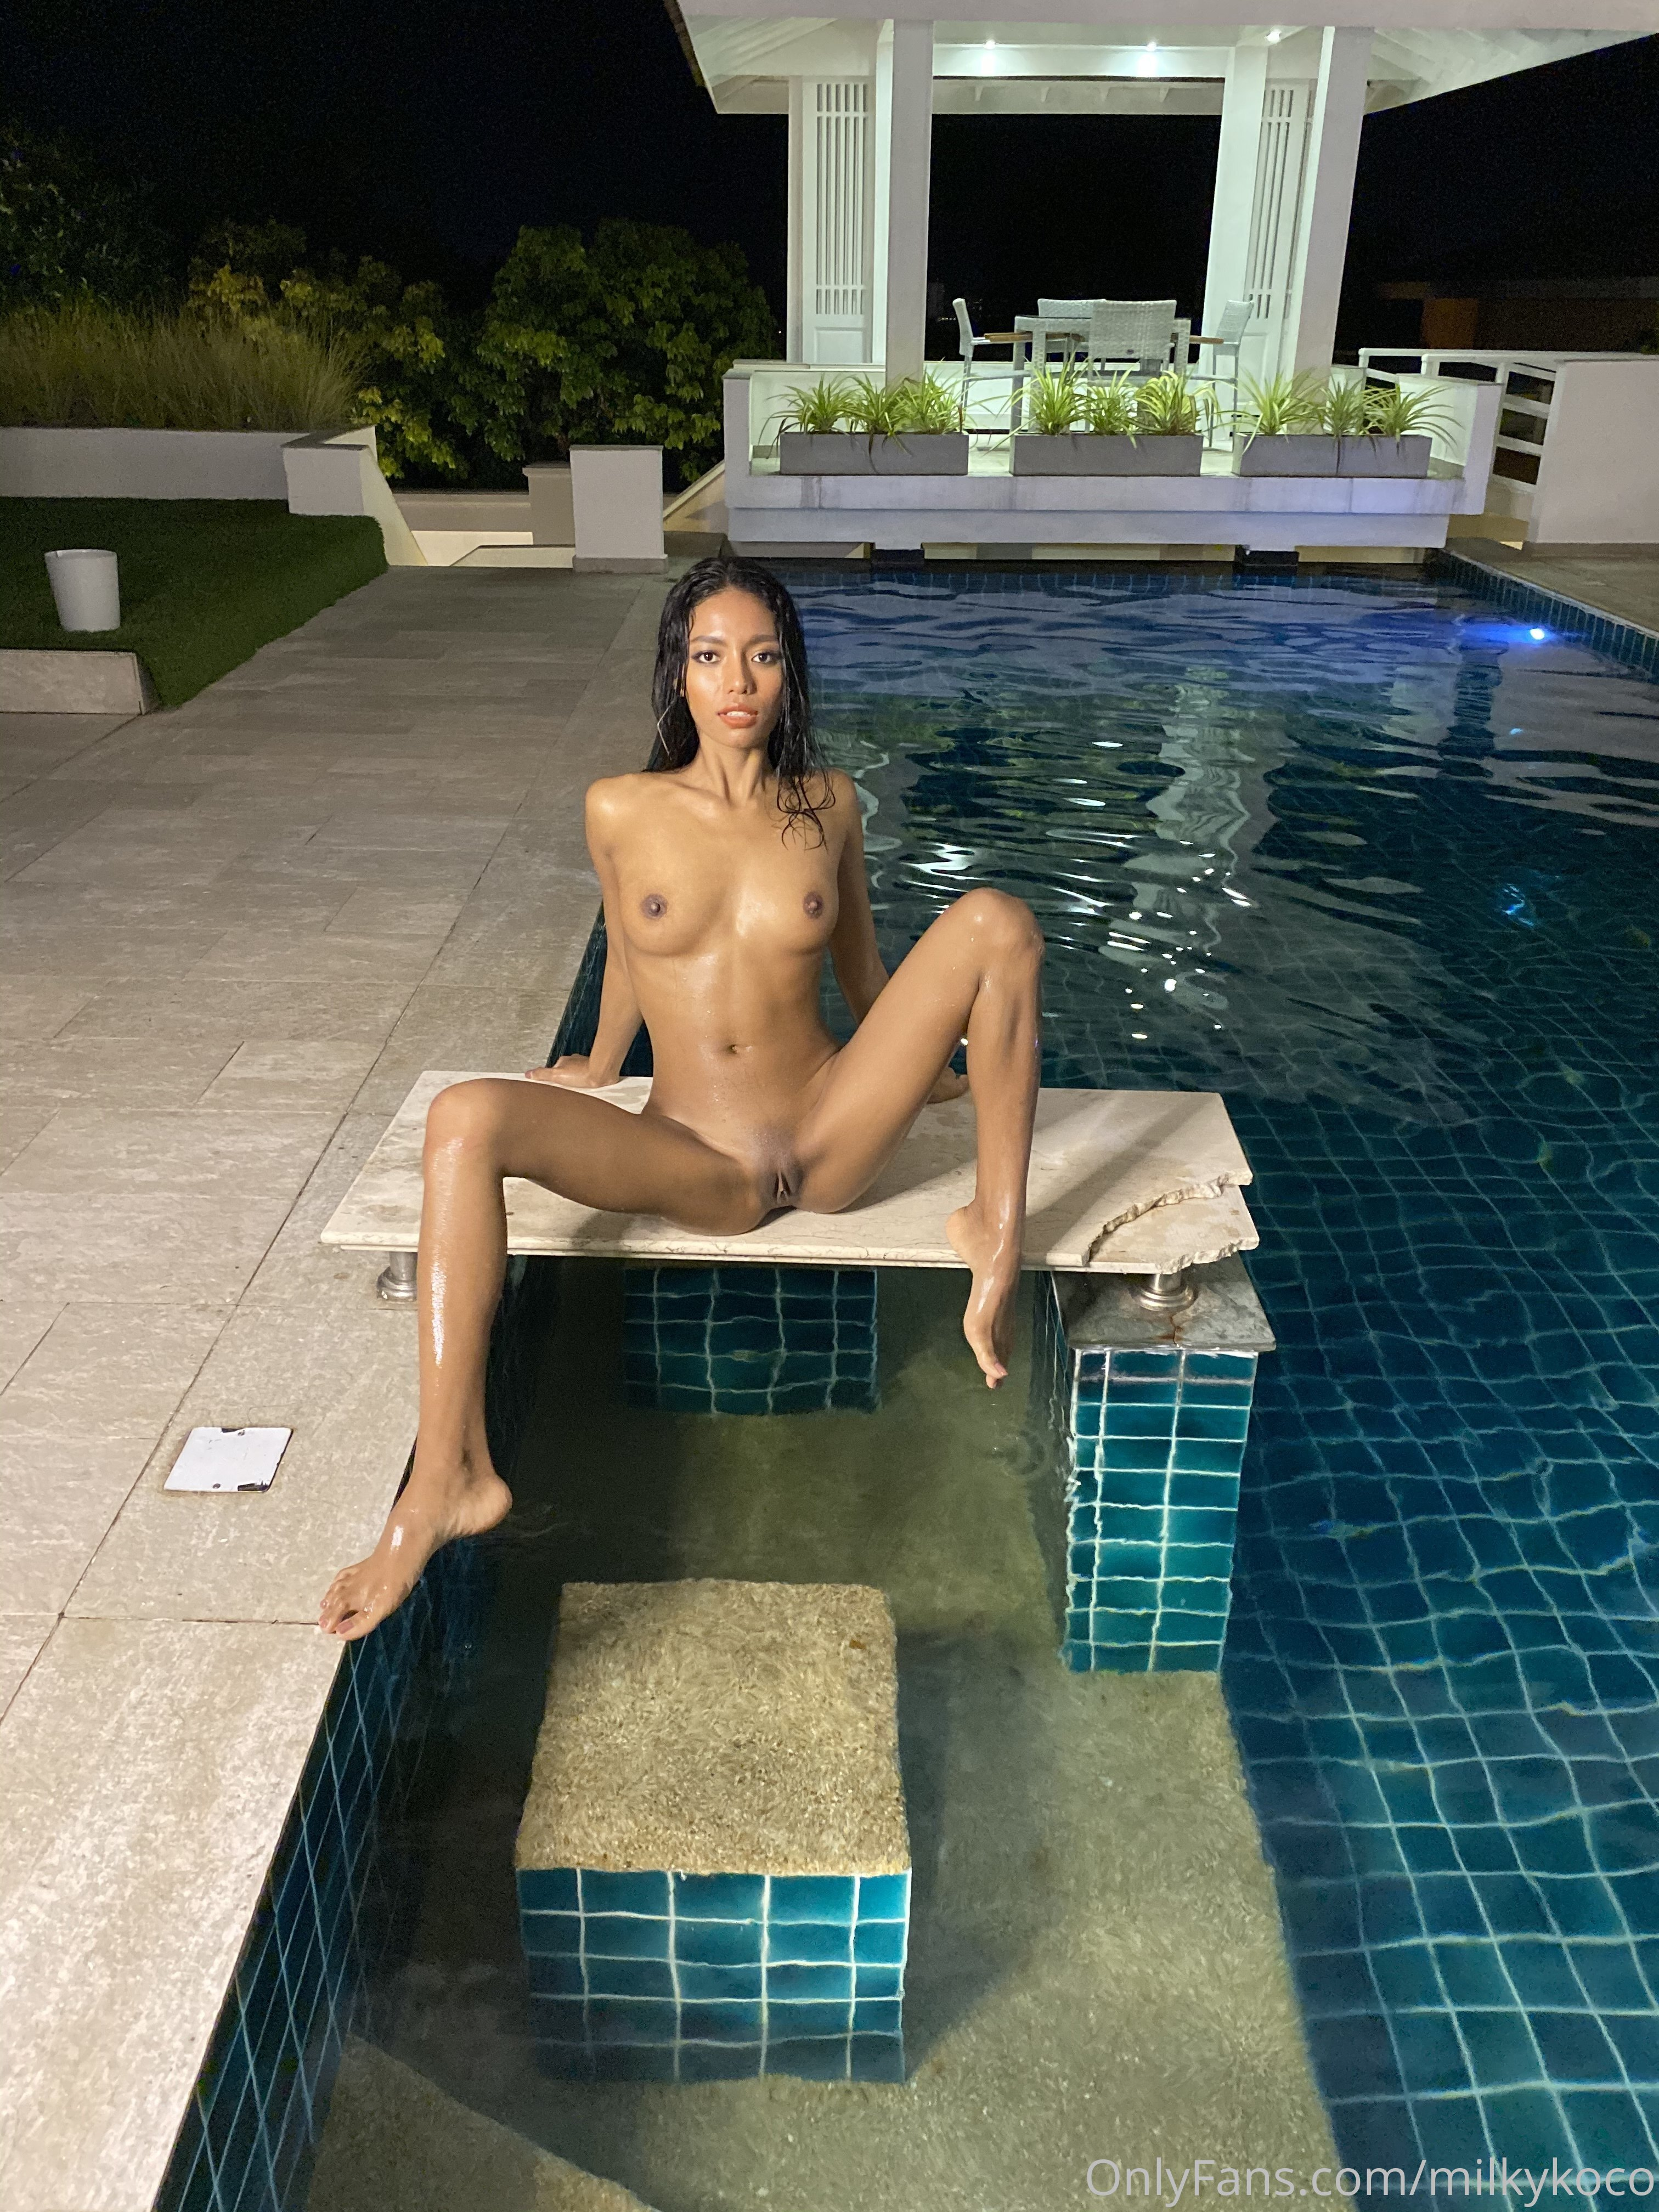 Koko Mylk Bangkok Model Leaked Onlyfans 0055